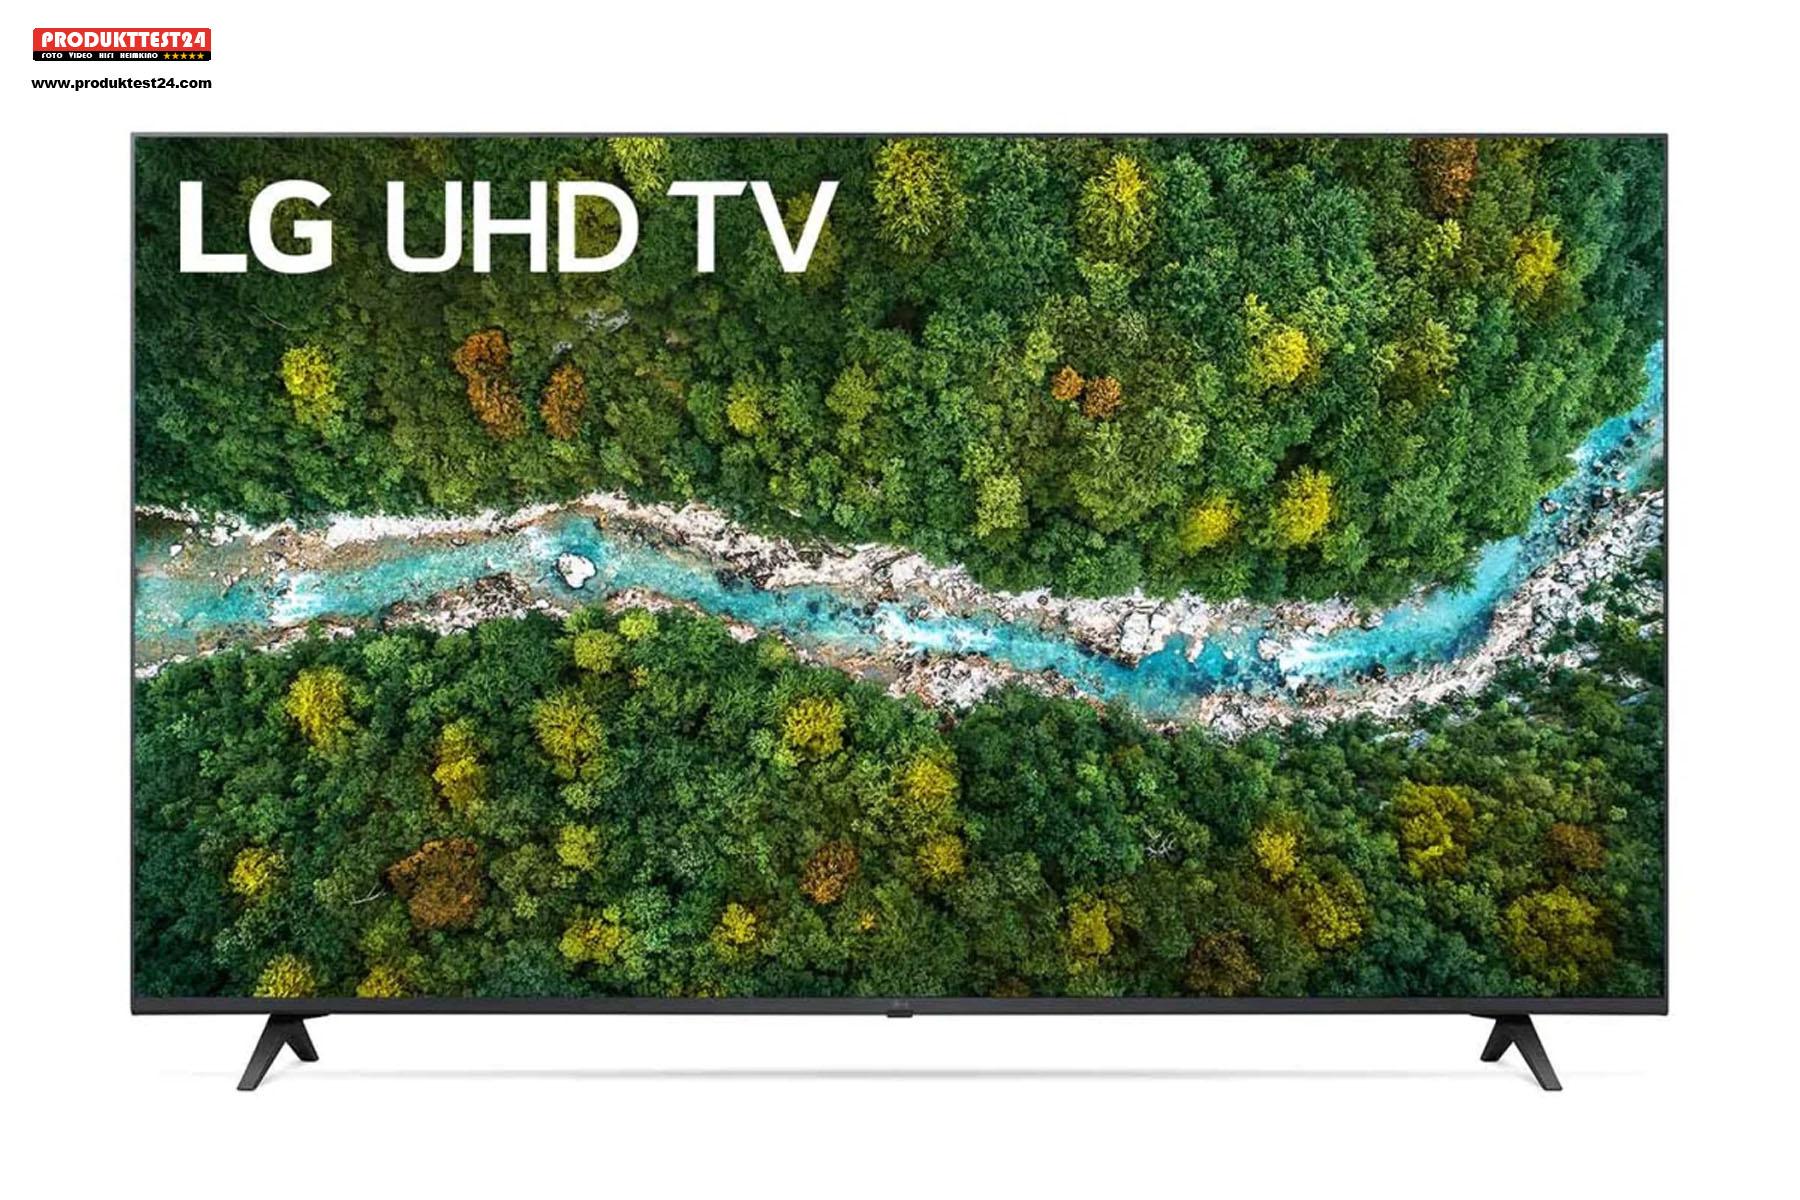 Günstiger 75 Zoll 4K-Fernseher - Der LG 75UP77009LB